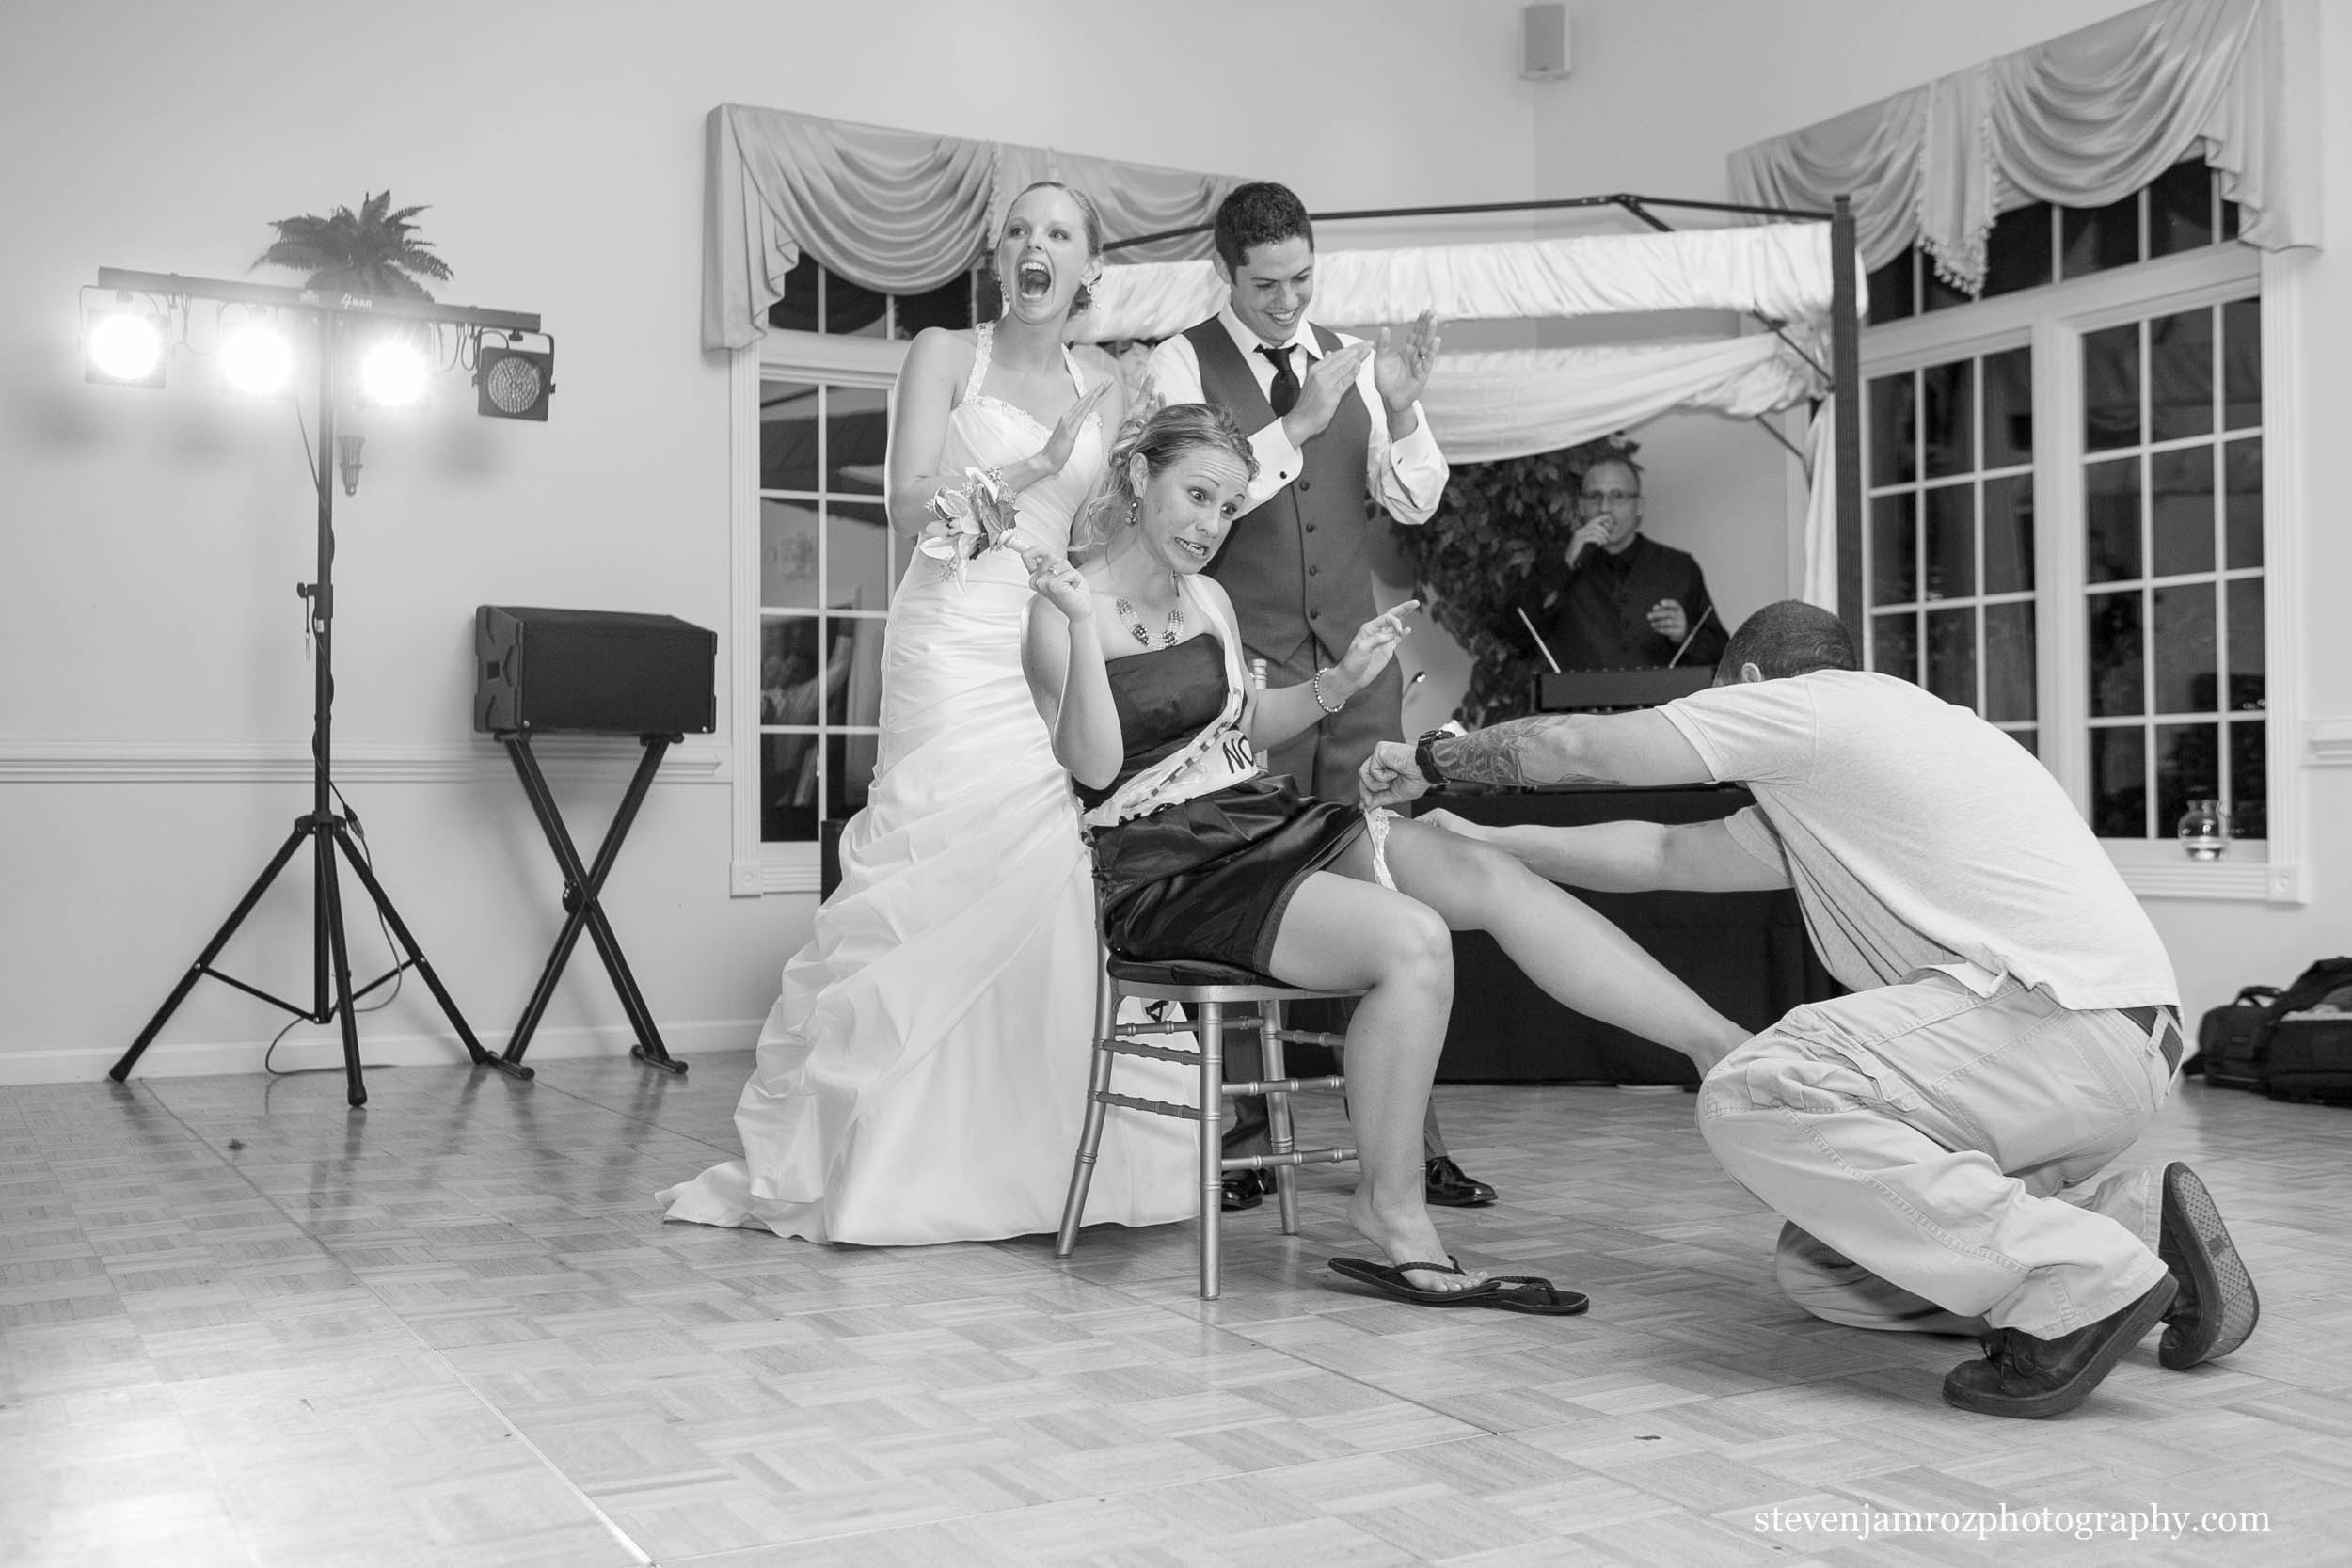 putting-garter-too-high-on-leg-for-comfort-photographer-steven-jamroz-0736.jpg